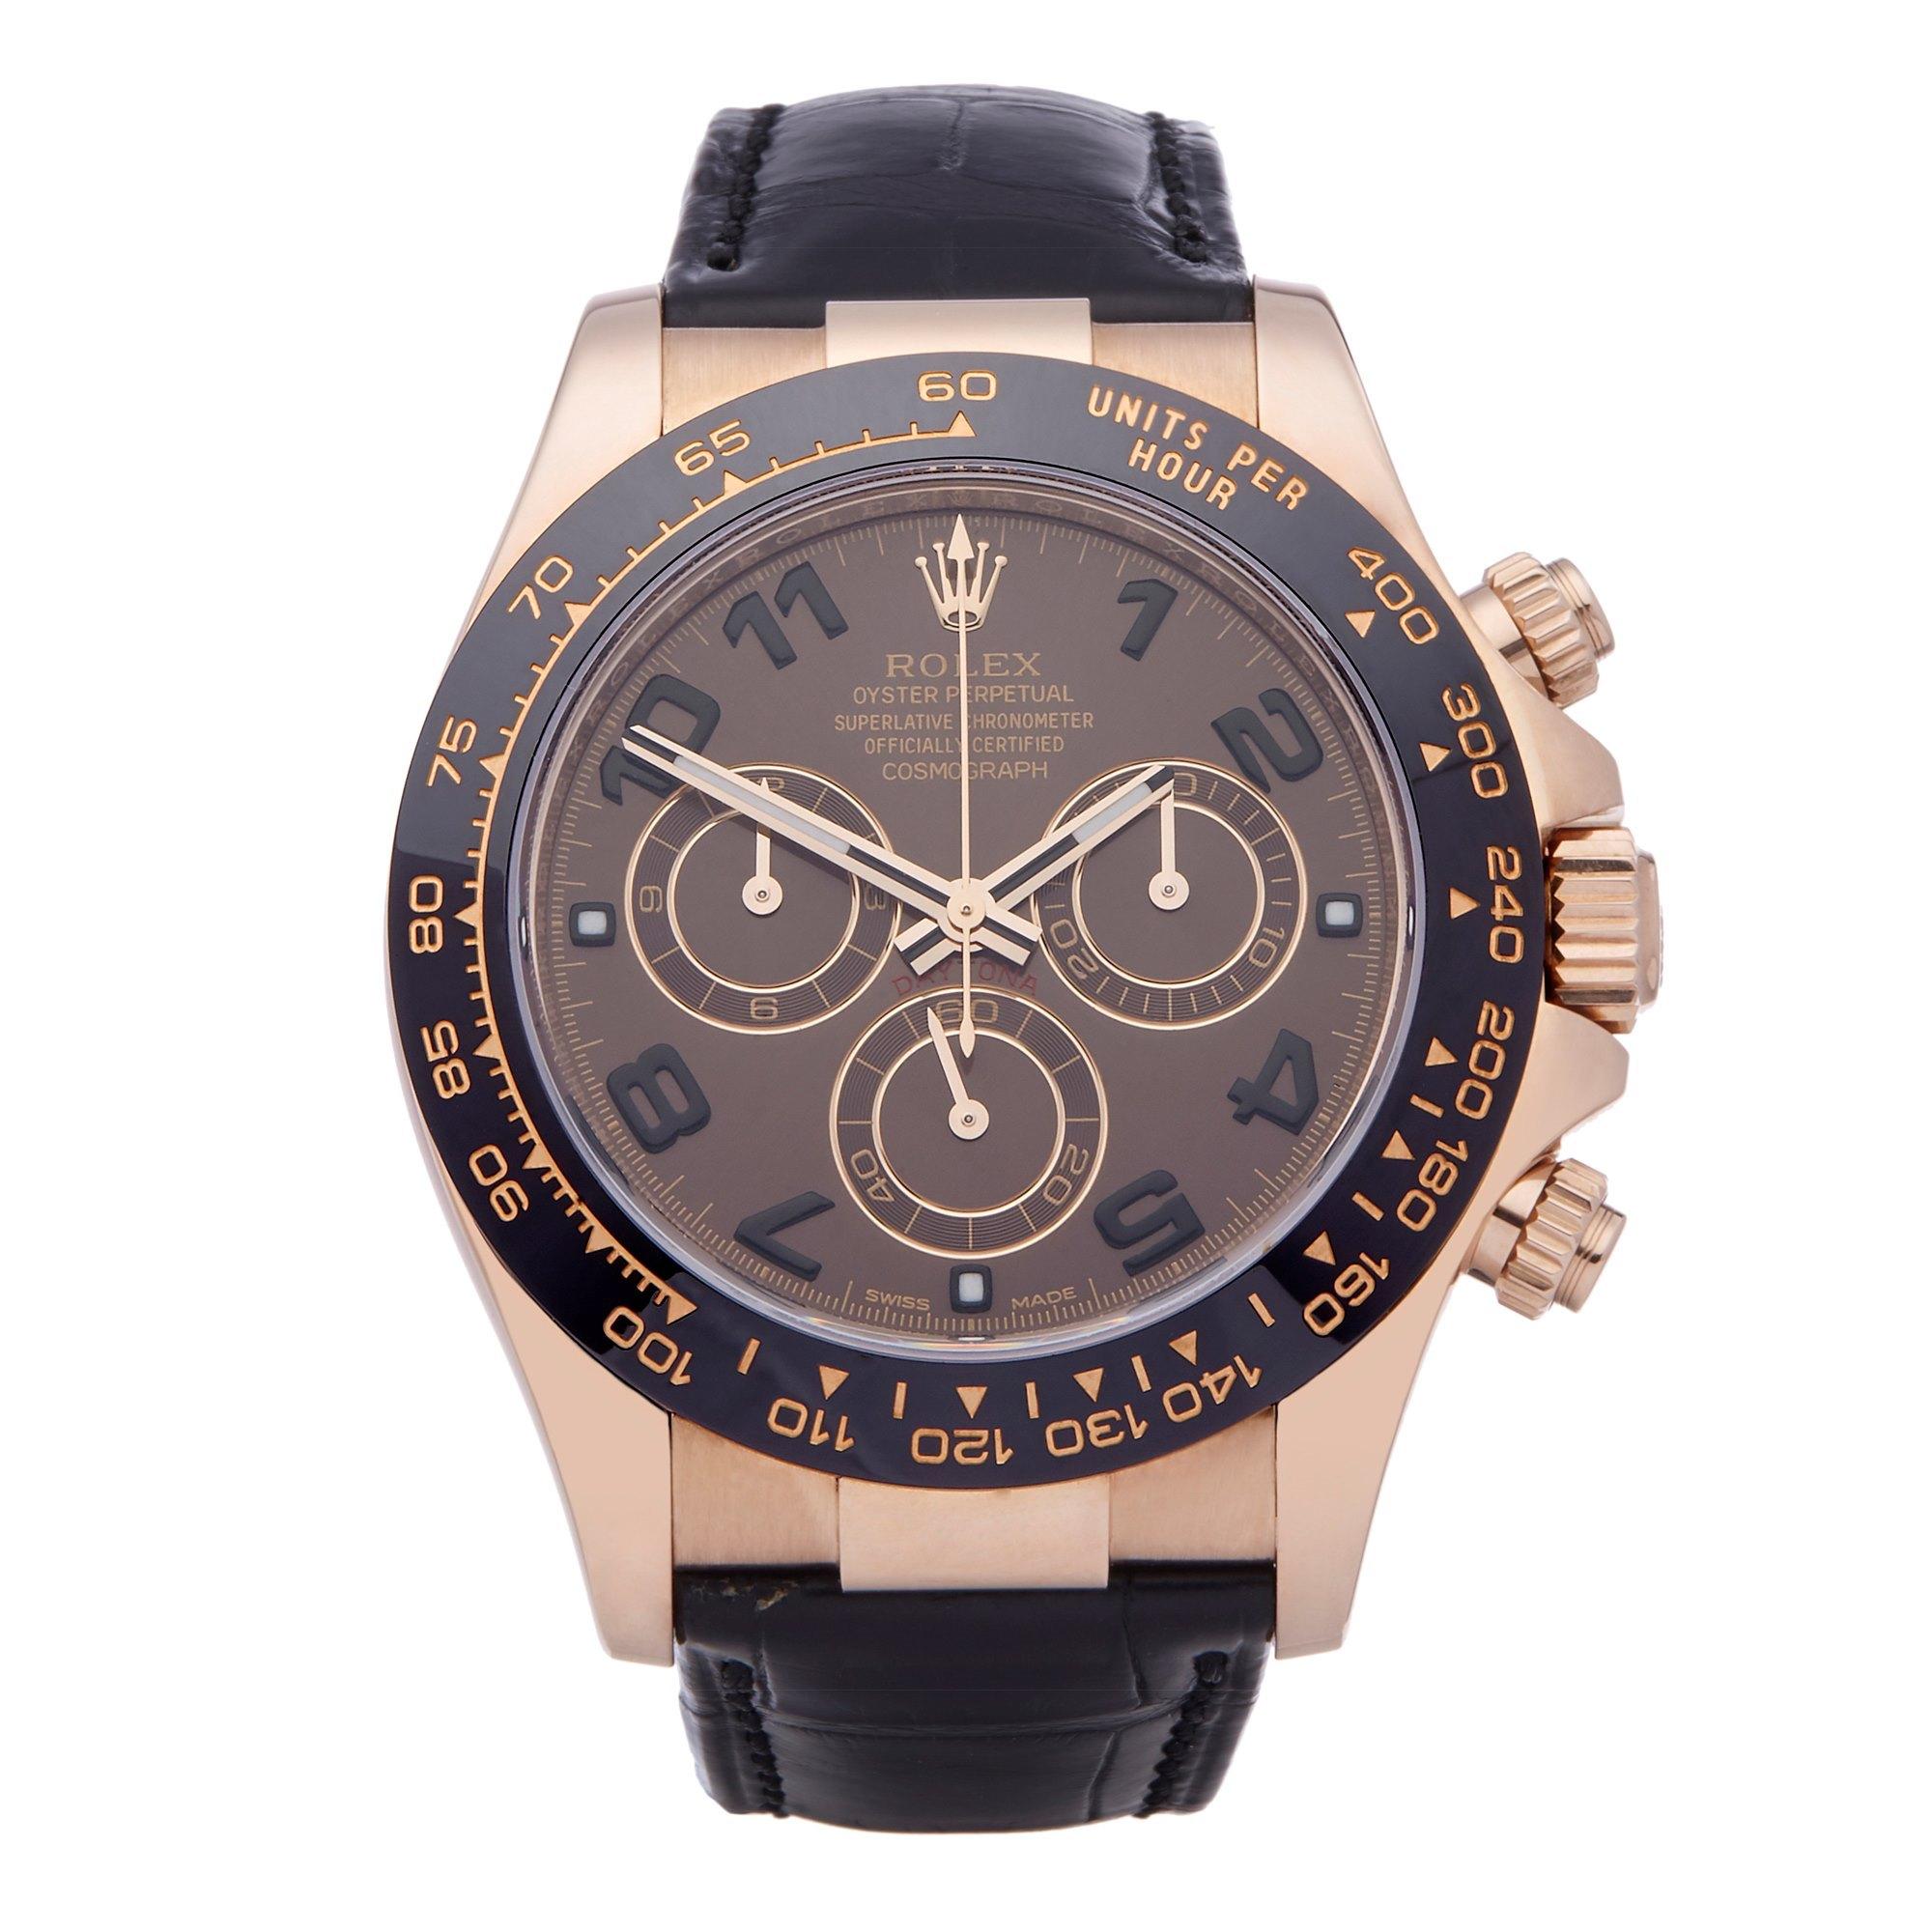 Rolex Daytona Chronograph Rose Gold 116515LN